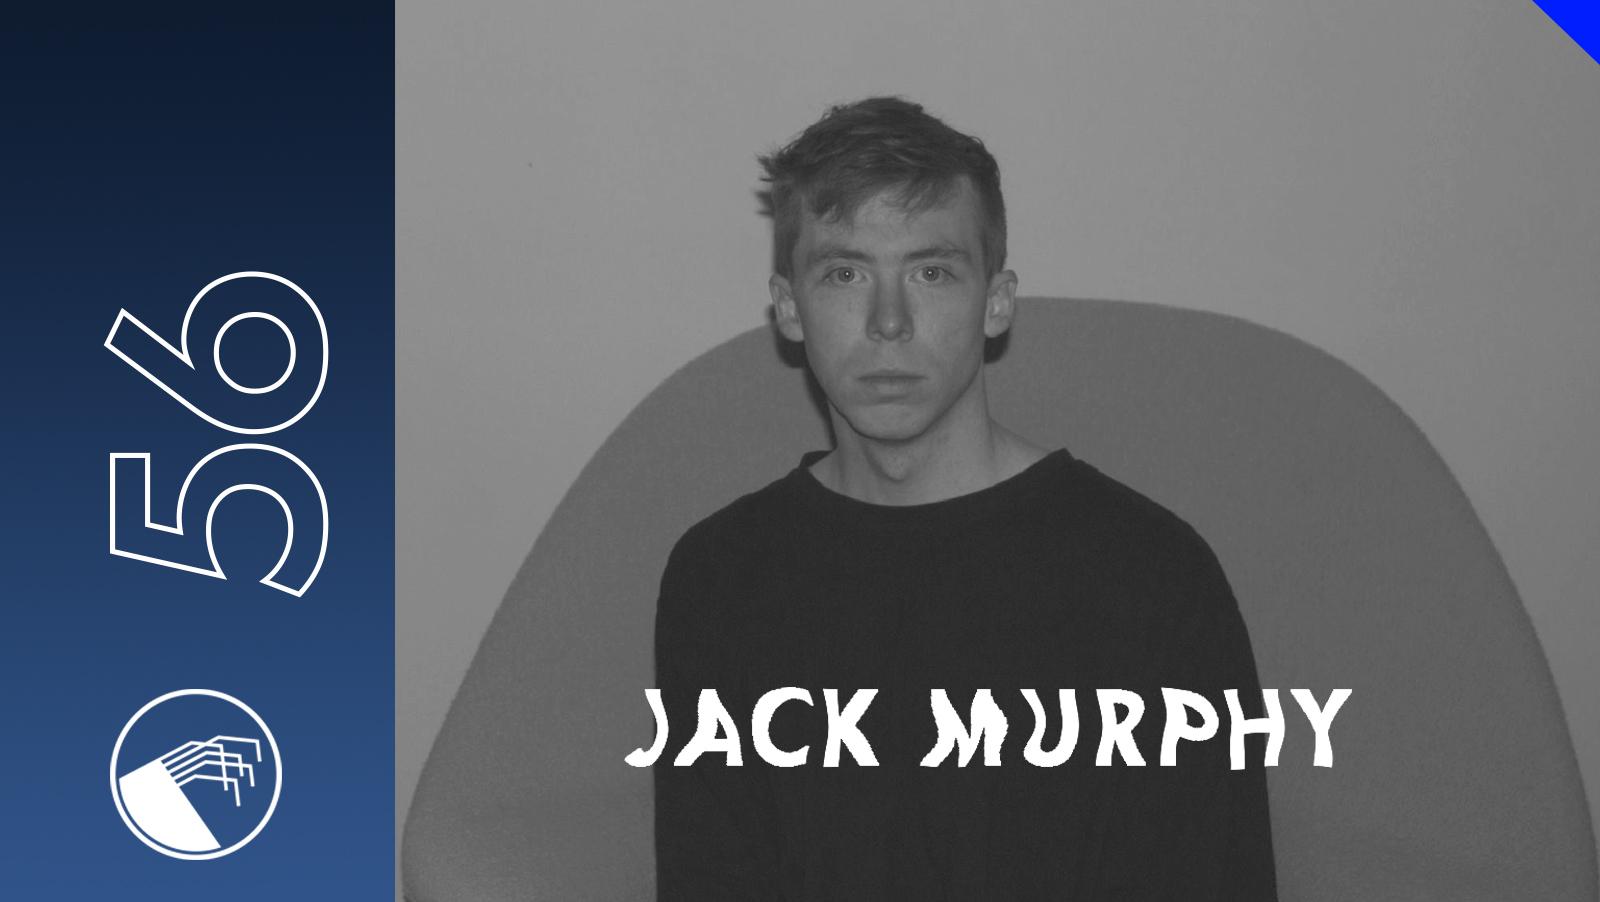 056 Jack Murphy